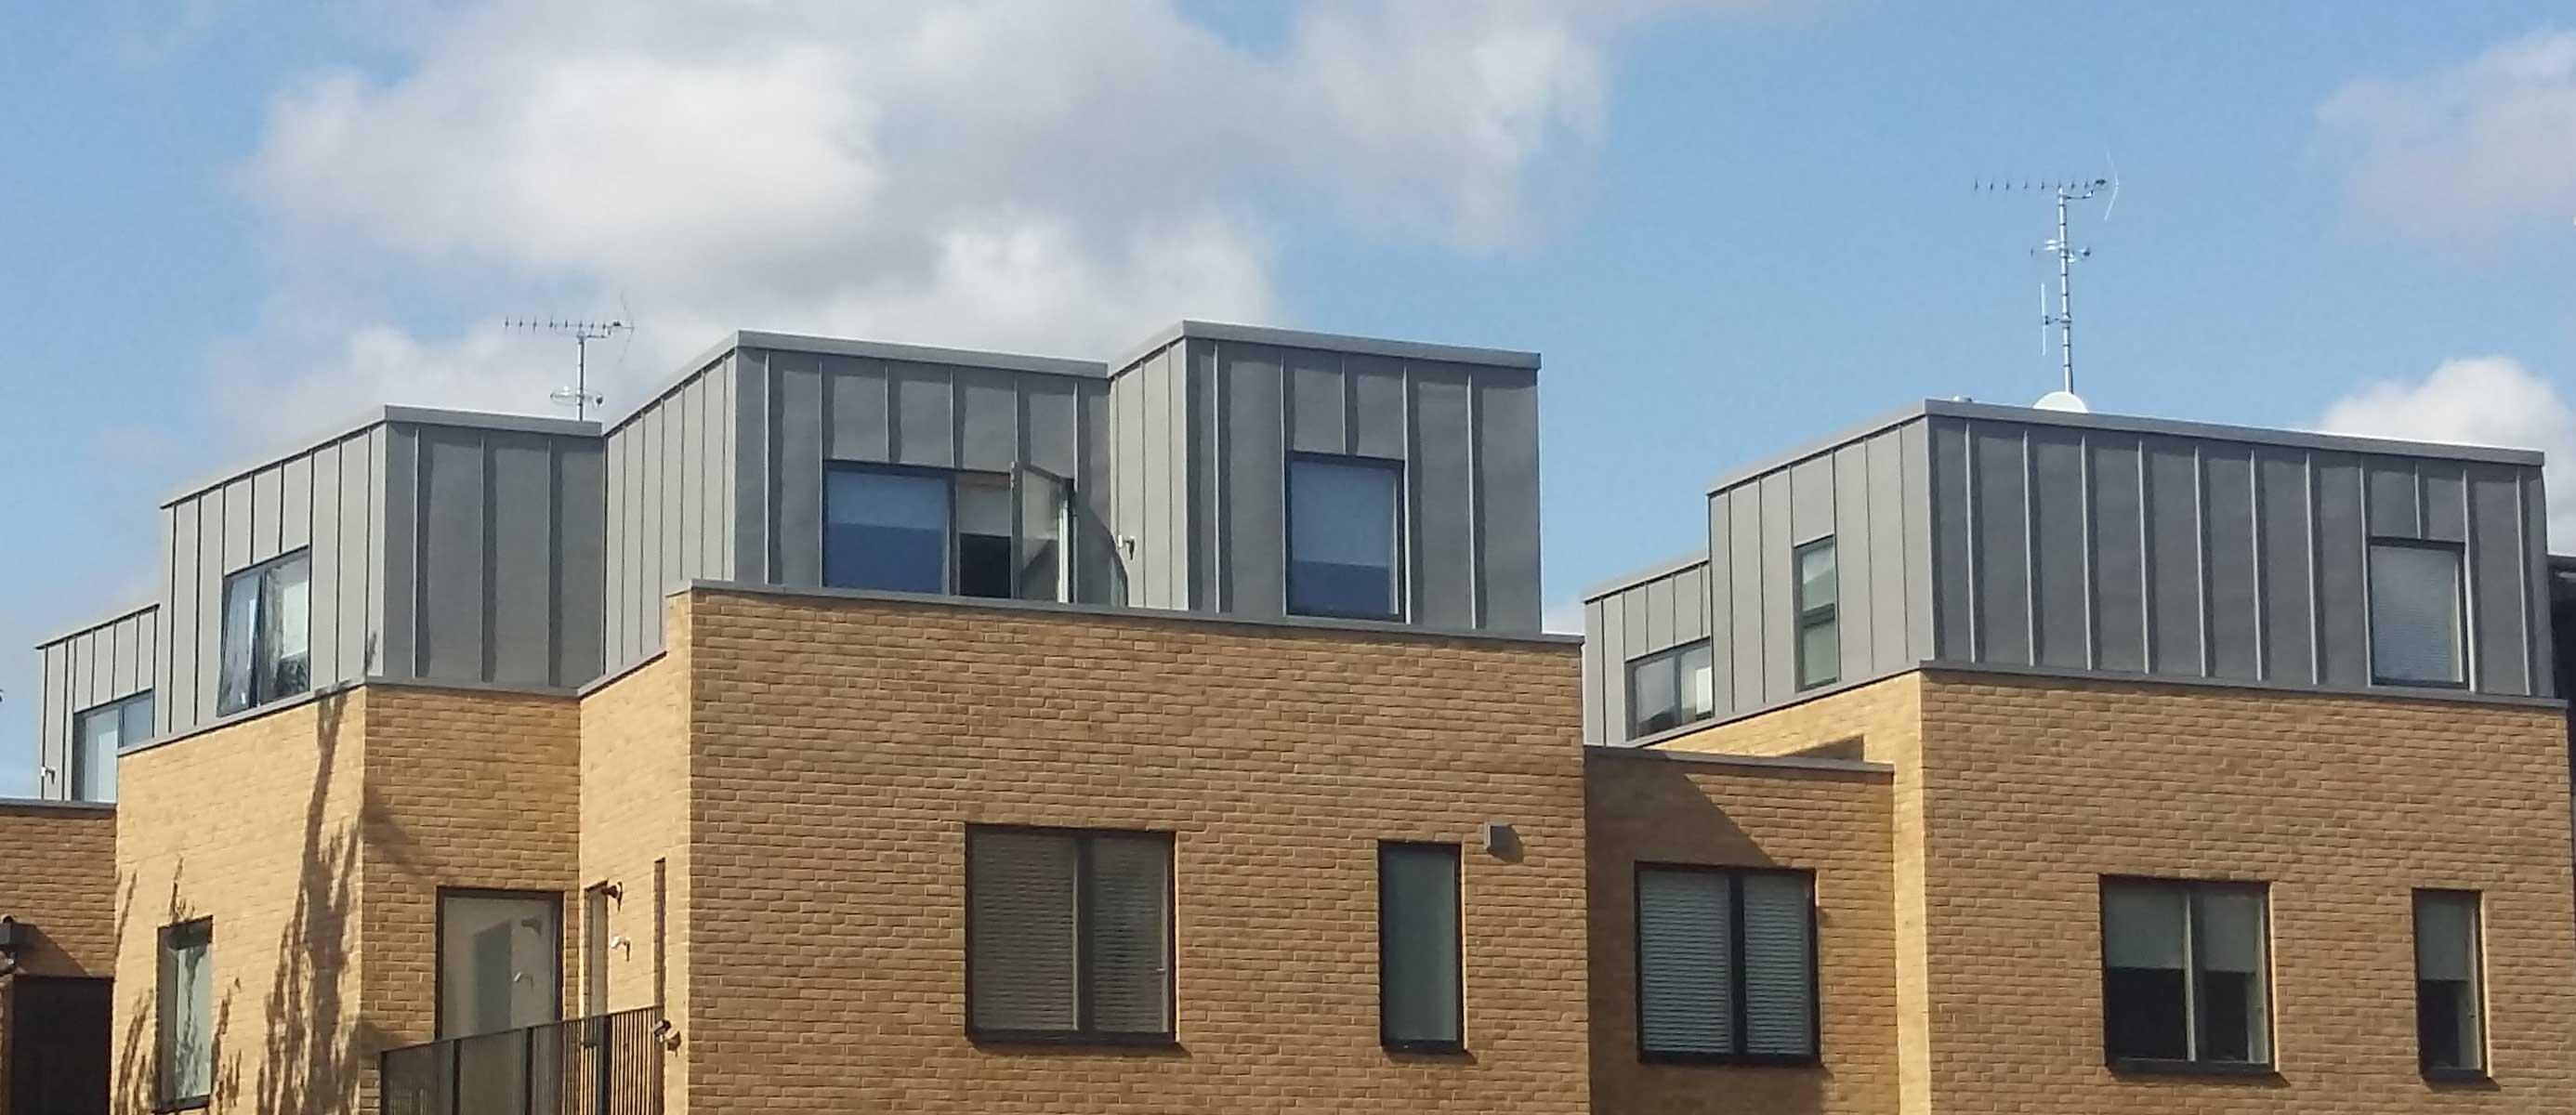 Zinc Cladding At Dane Place Metal Roof Ltd